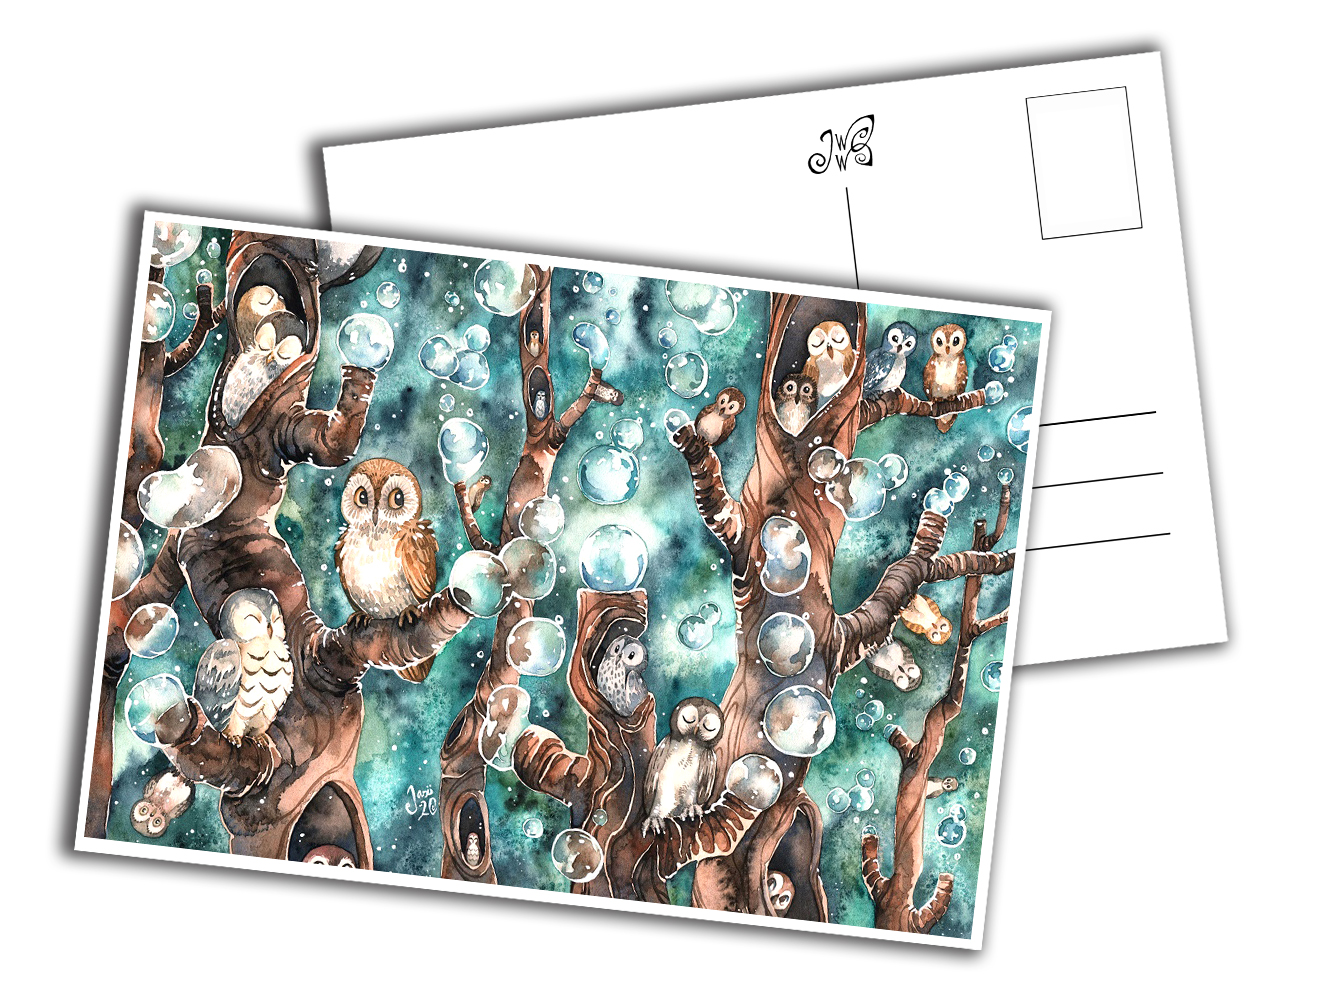 Card - The Kingdom of Owls